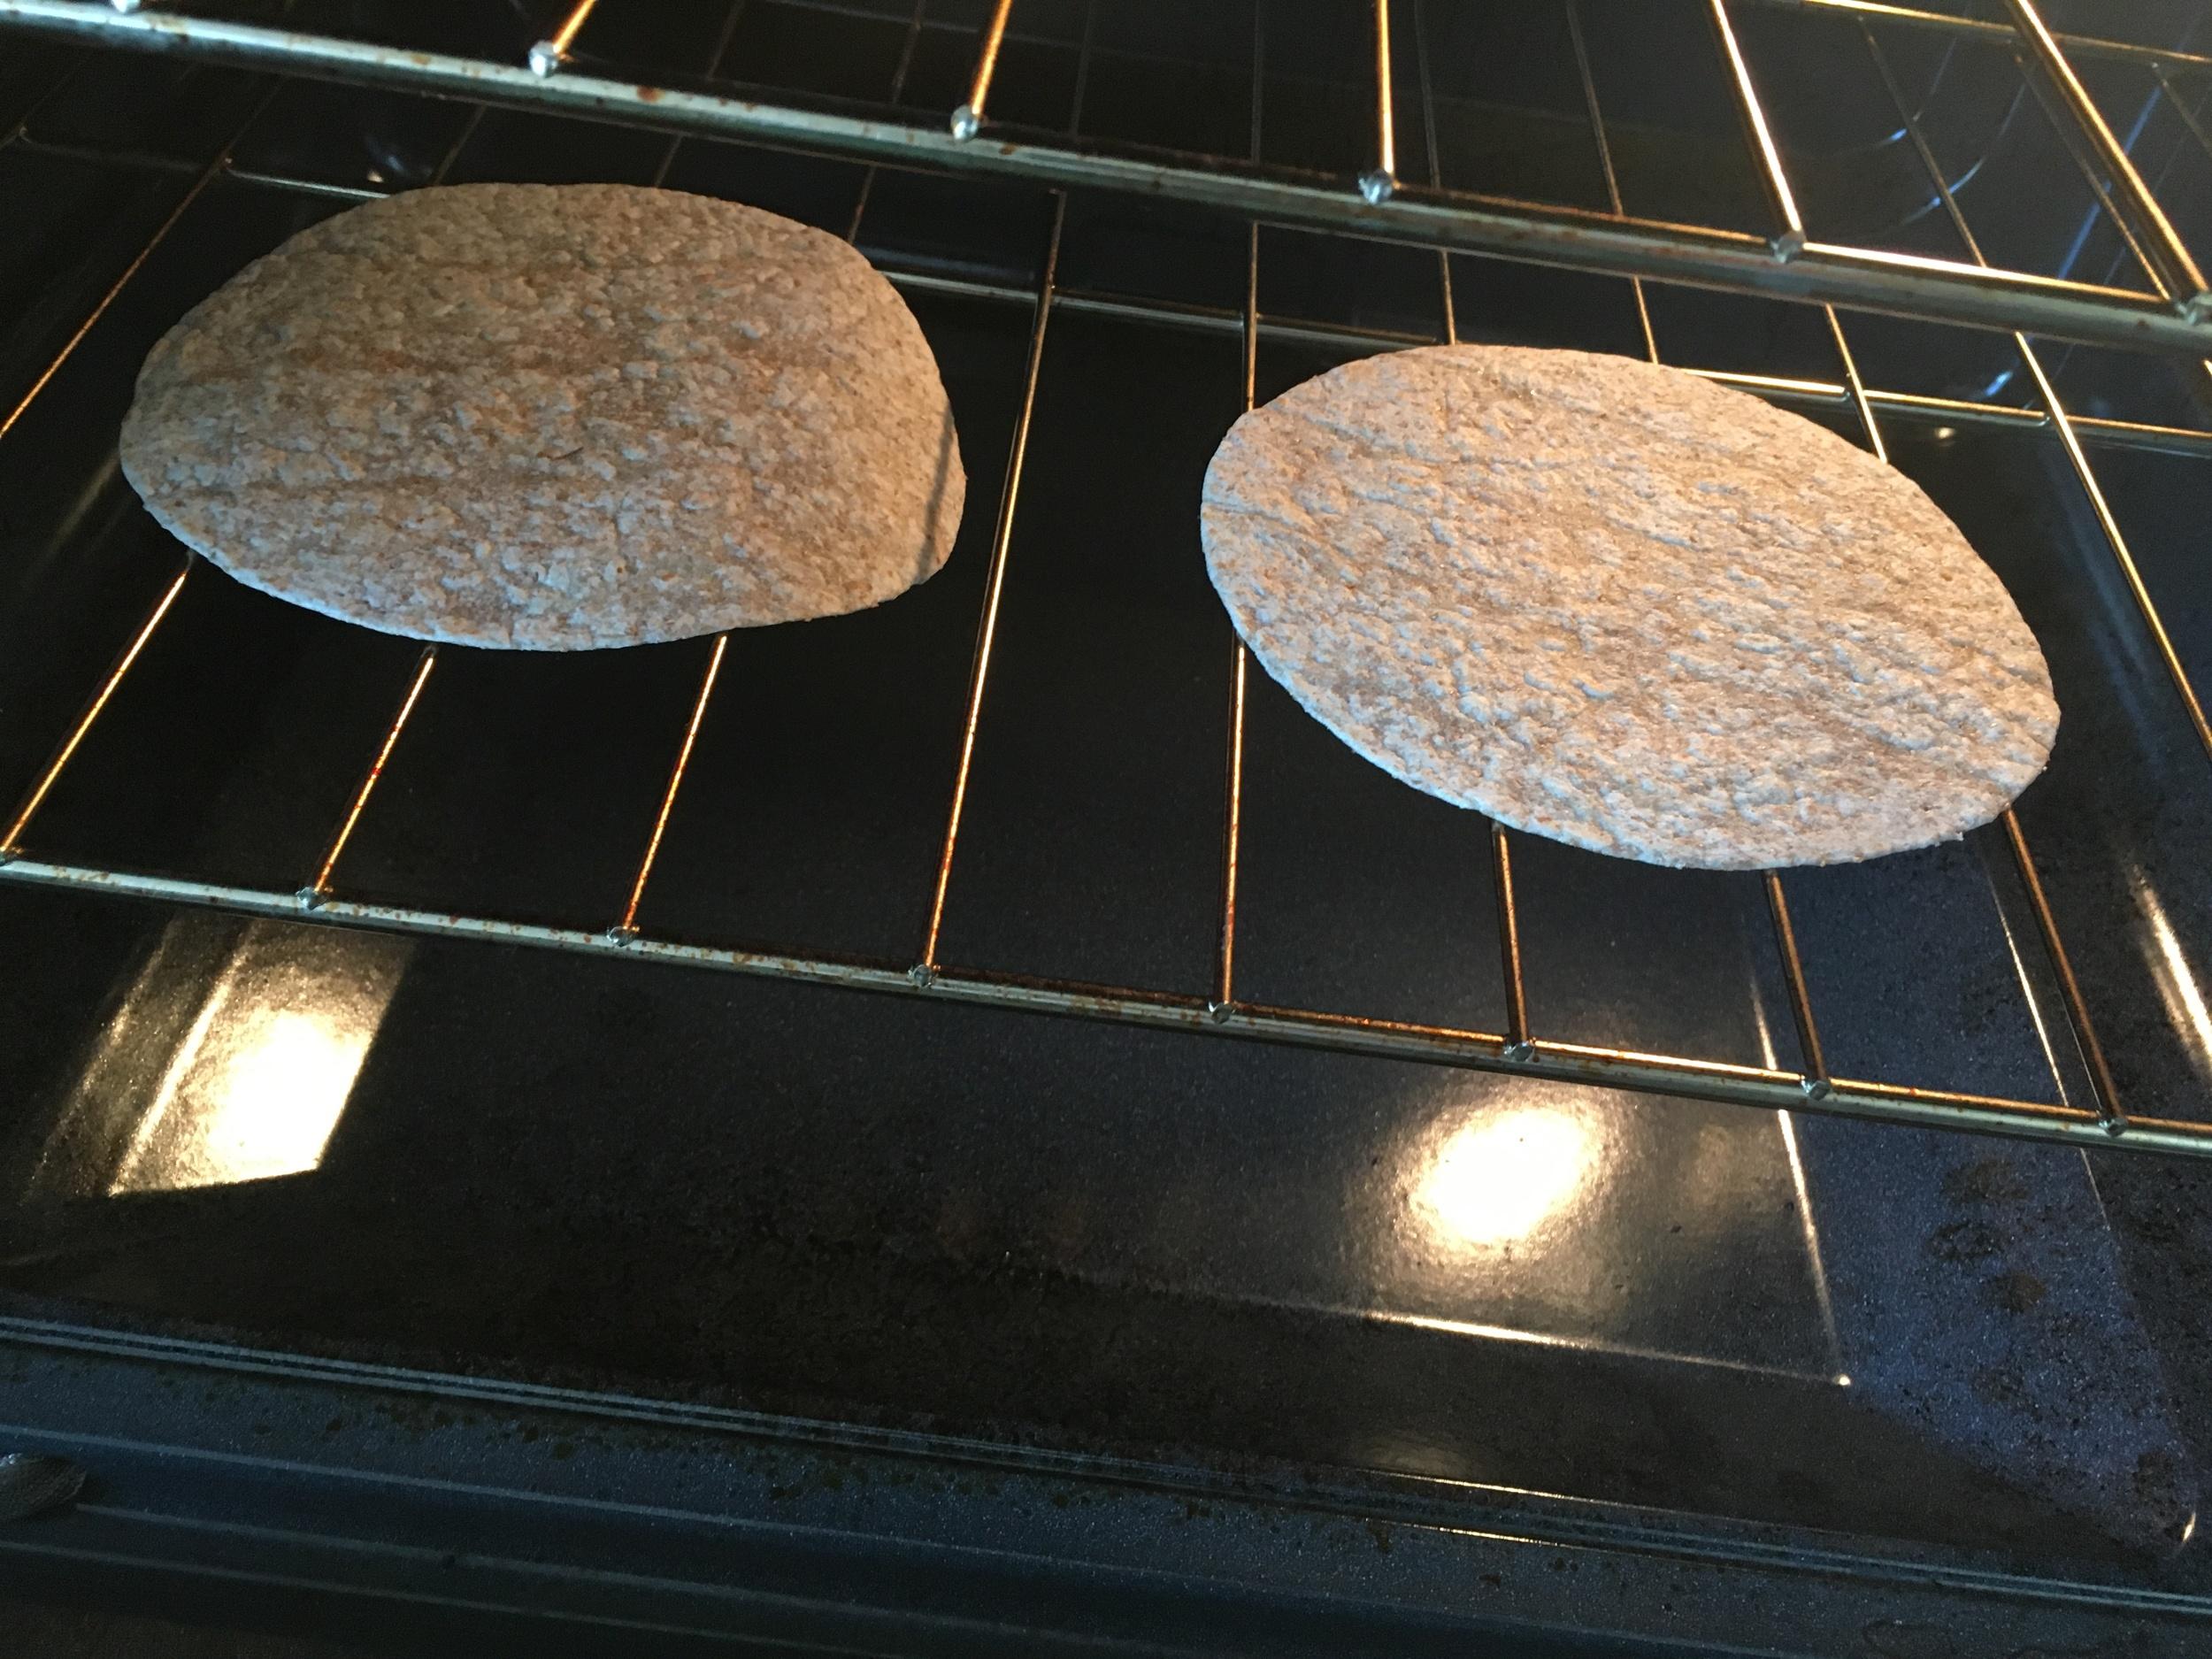 Food - Breakfast Burrito5.JPG